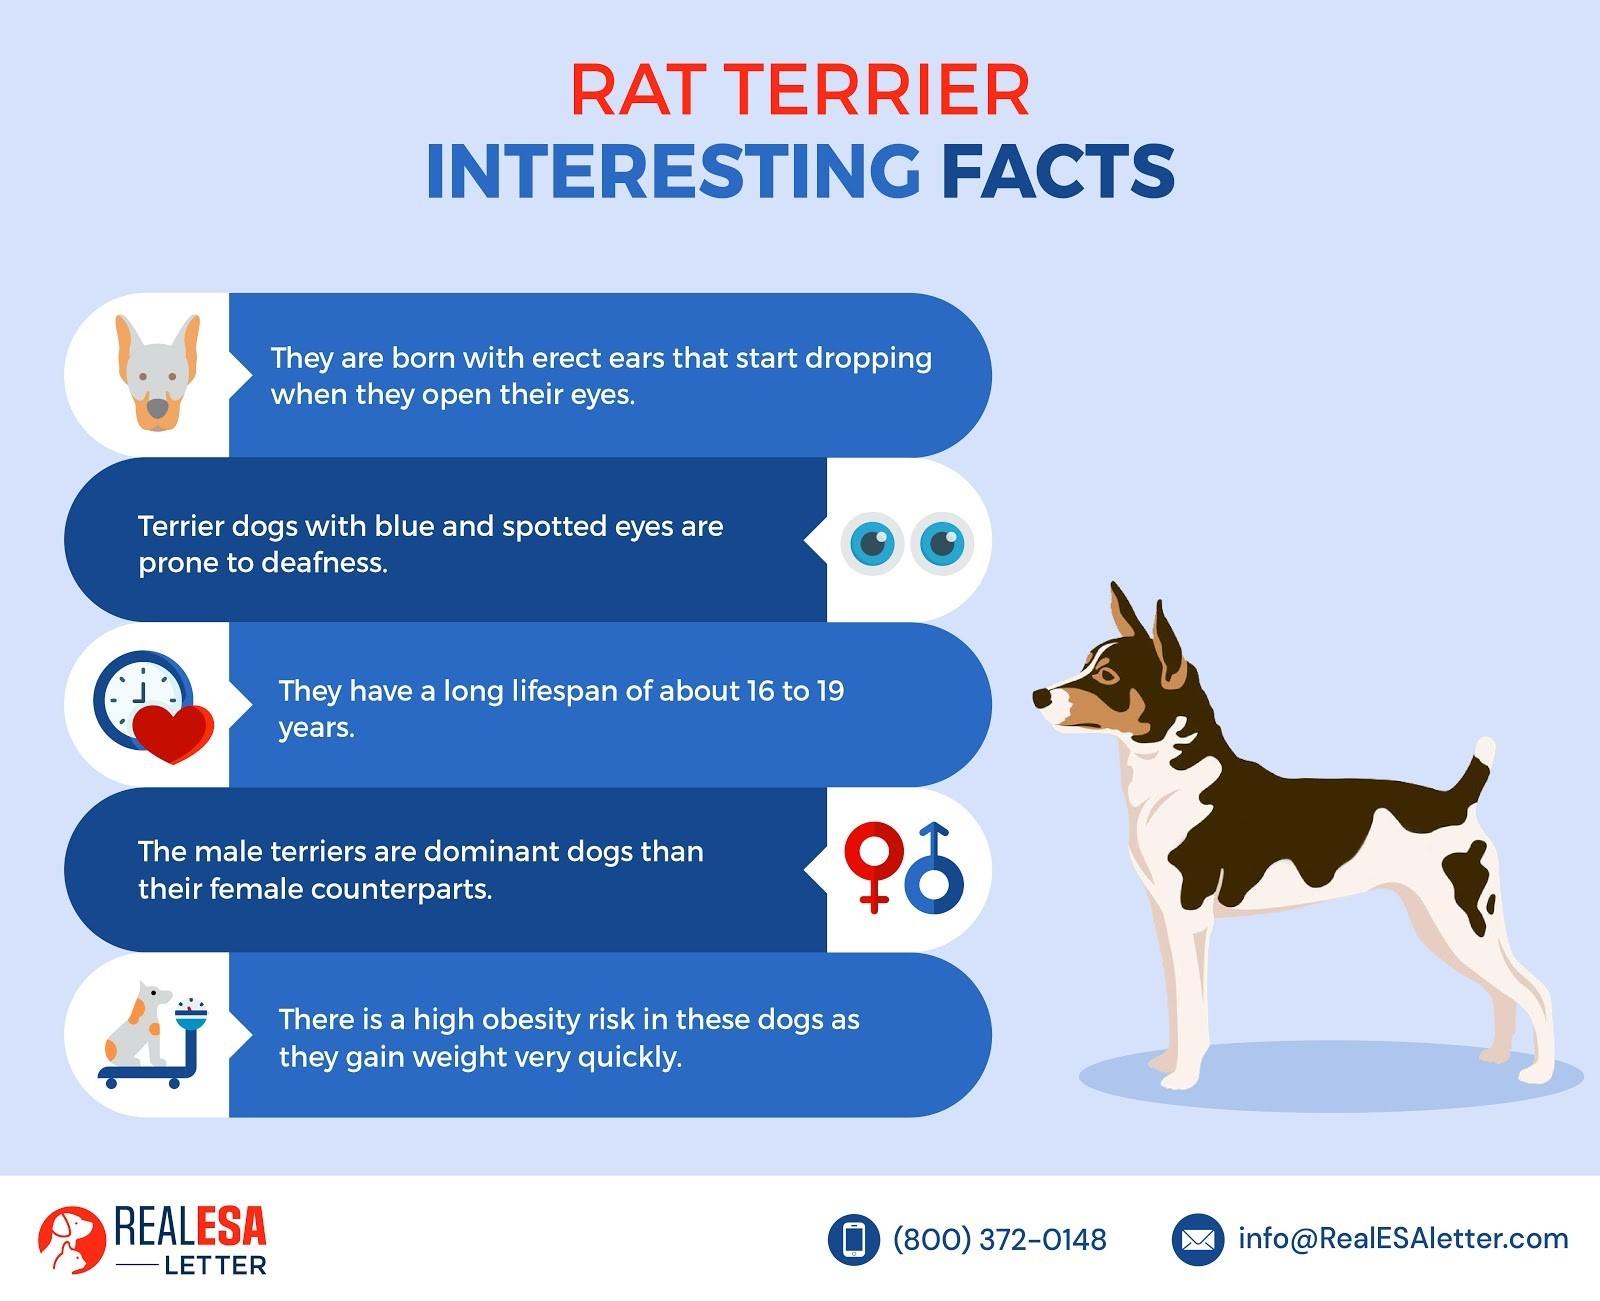 Rat Terrier - Interesting Facts